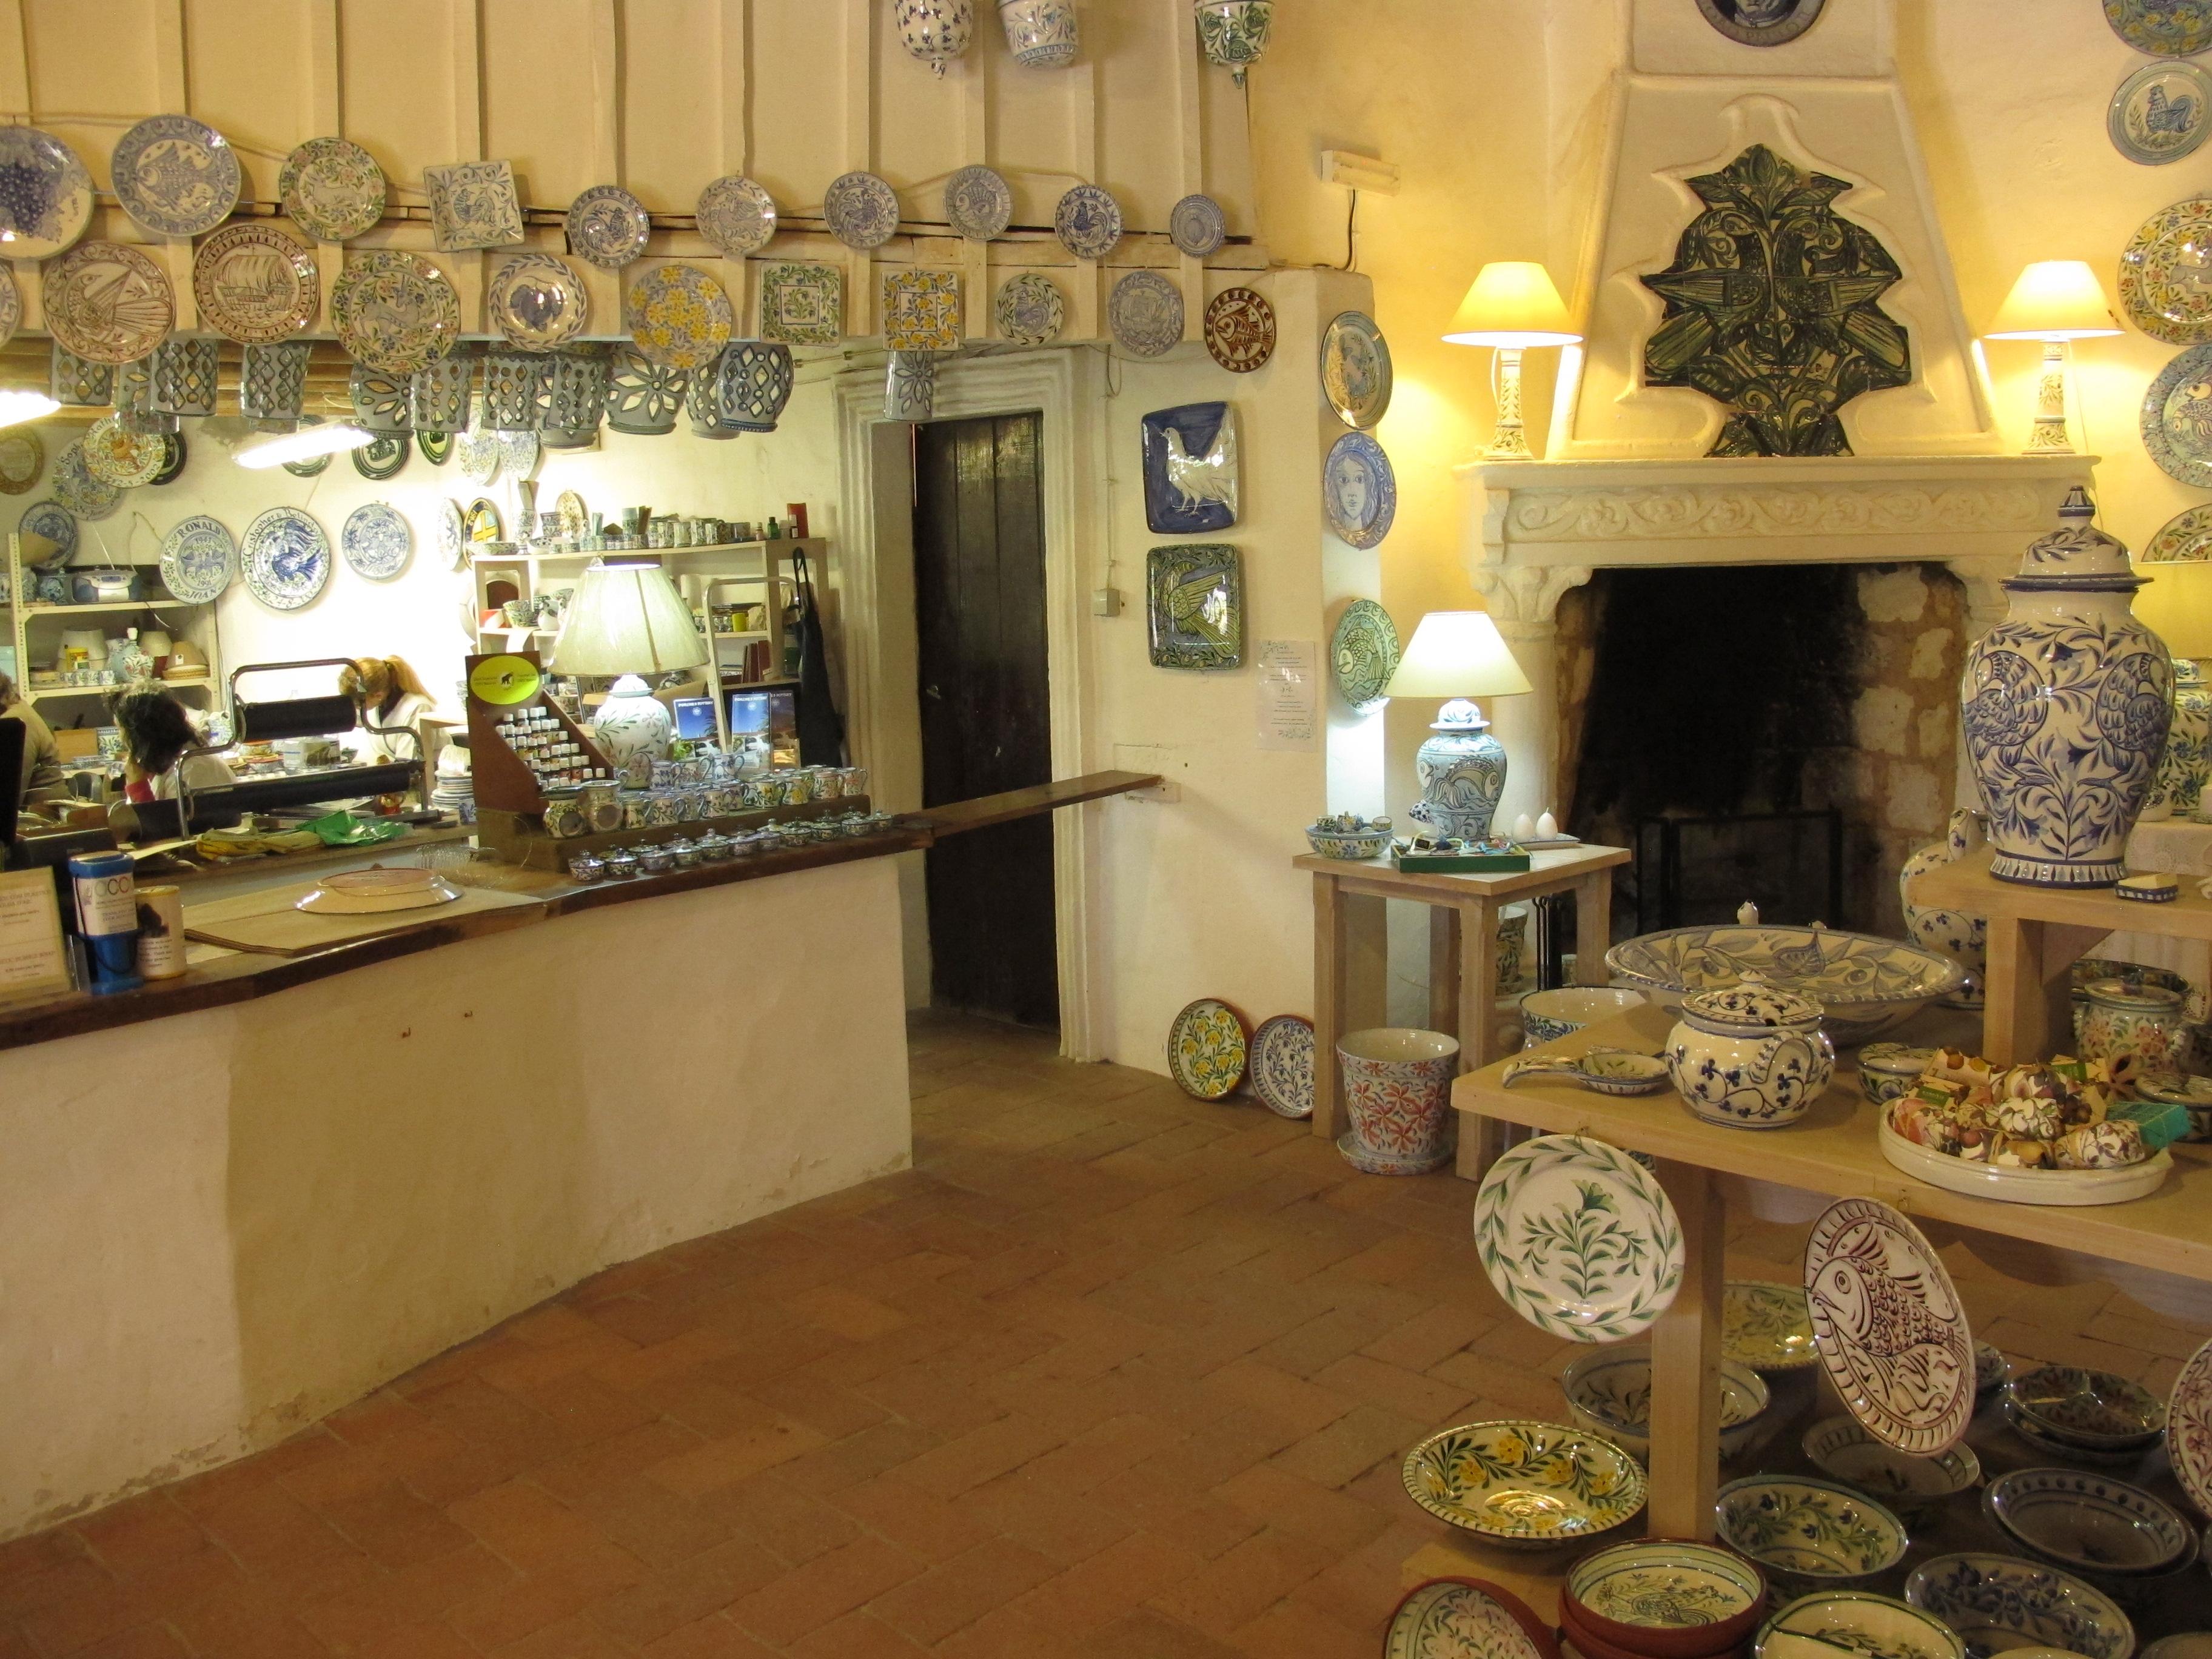 Töpfern, Keramik, Portugal, Algarve, Handwerk. Handwerkskunst, Reisefeder, blog, travelblog, Reiseblog